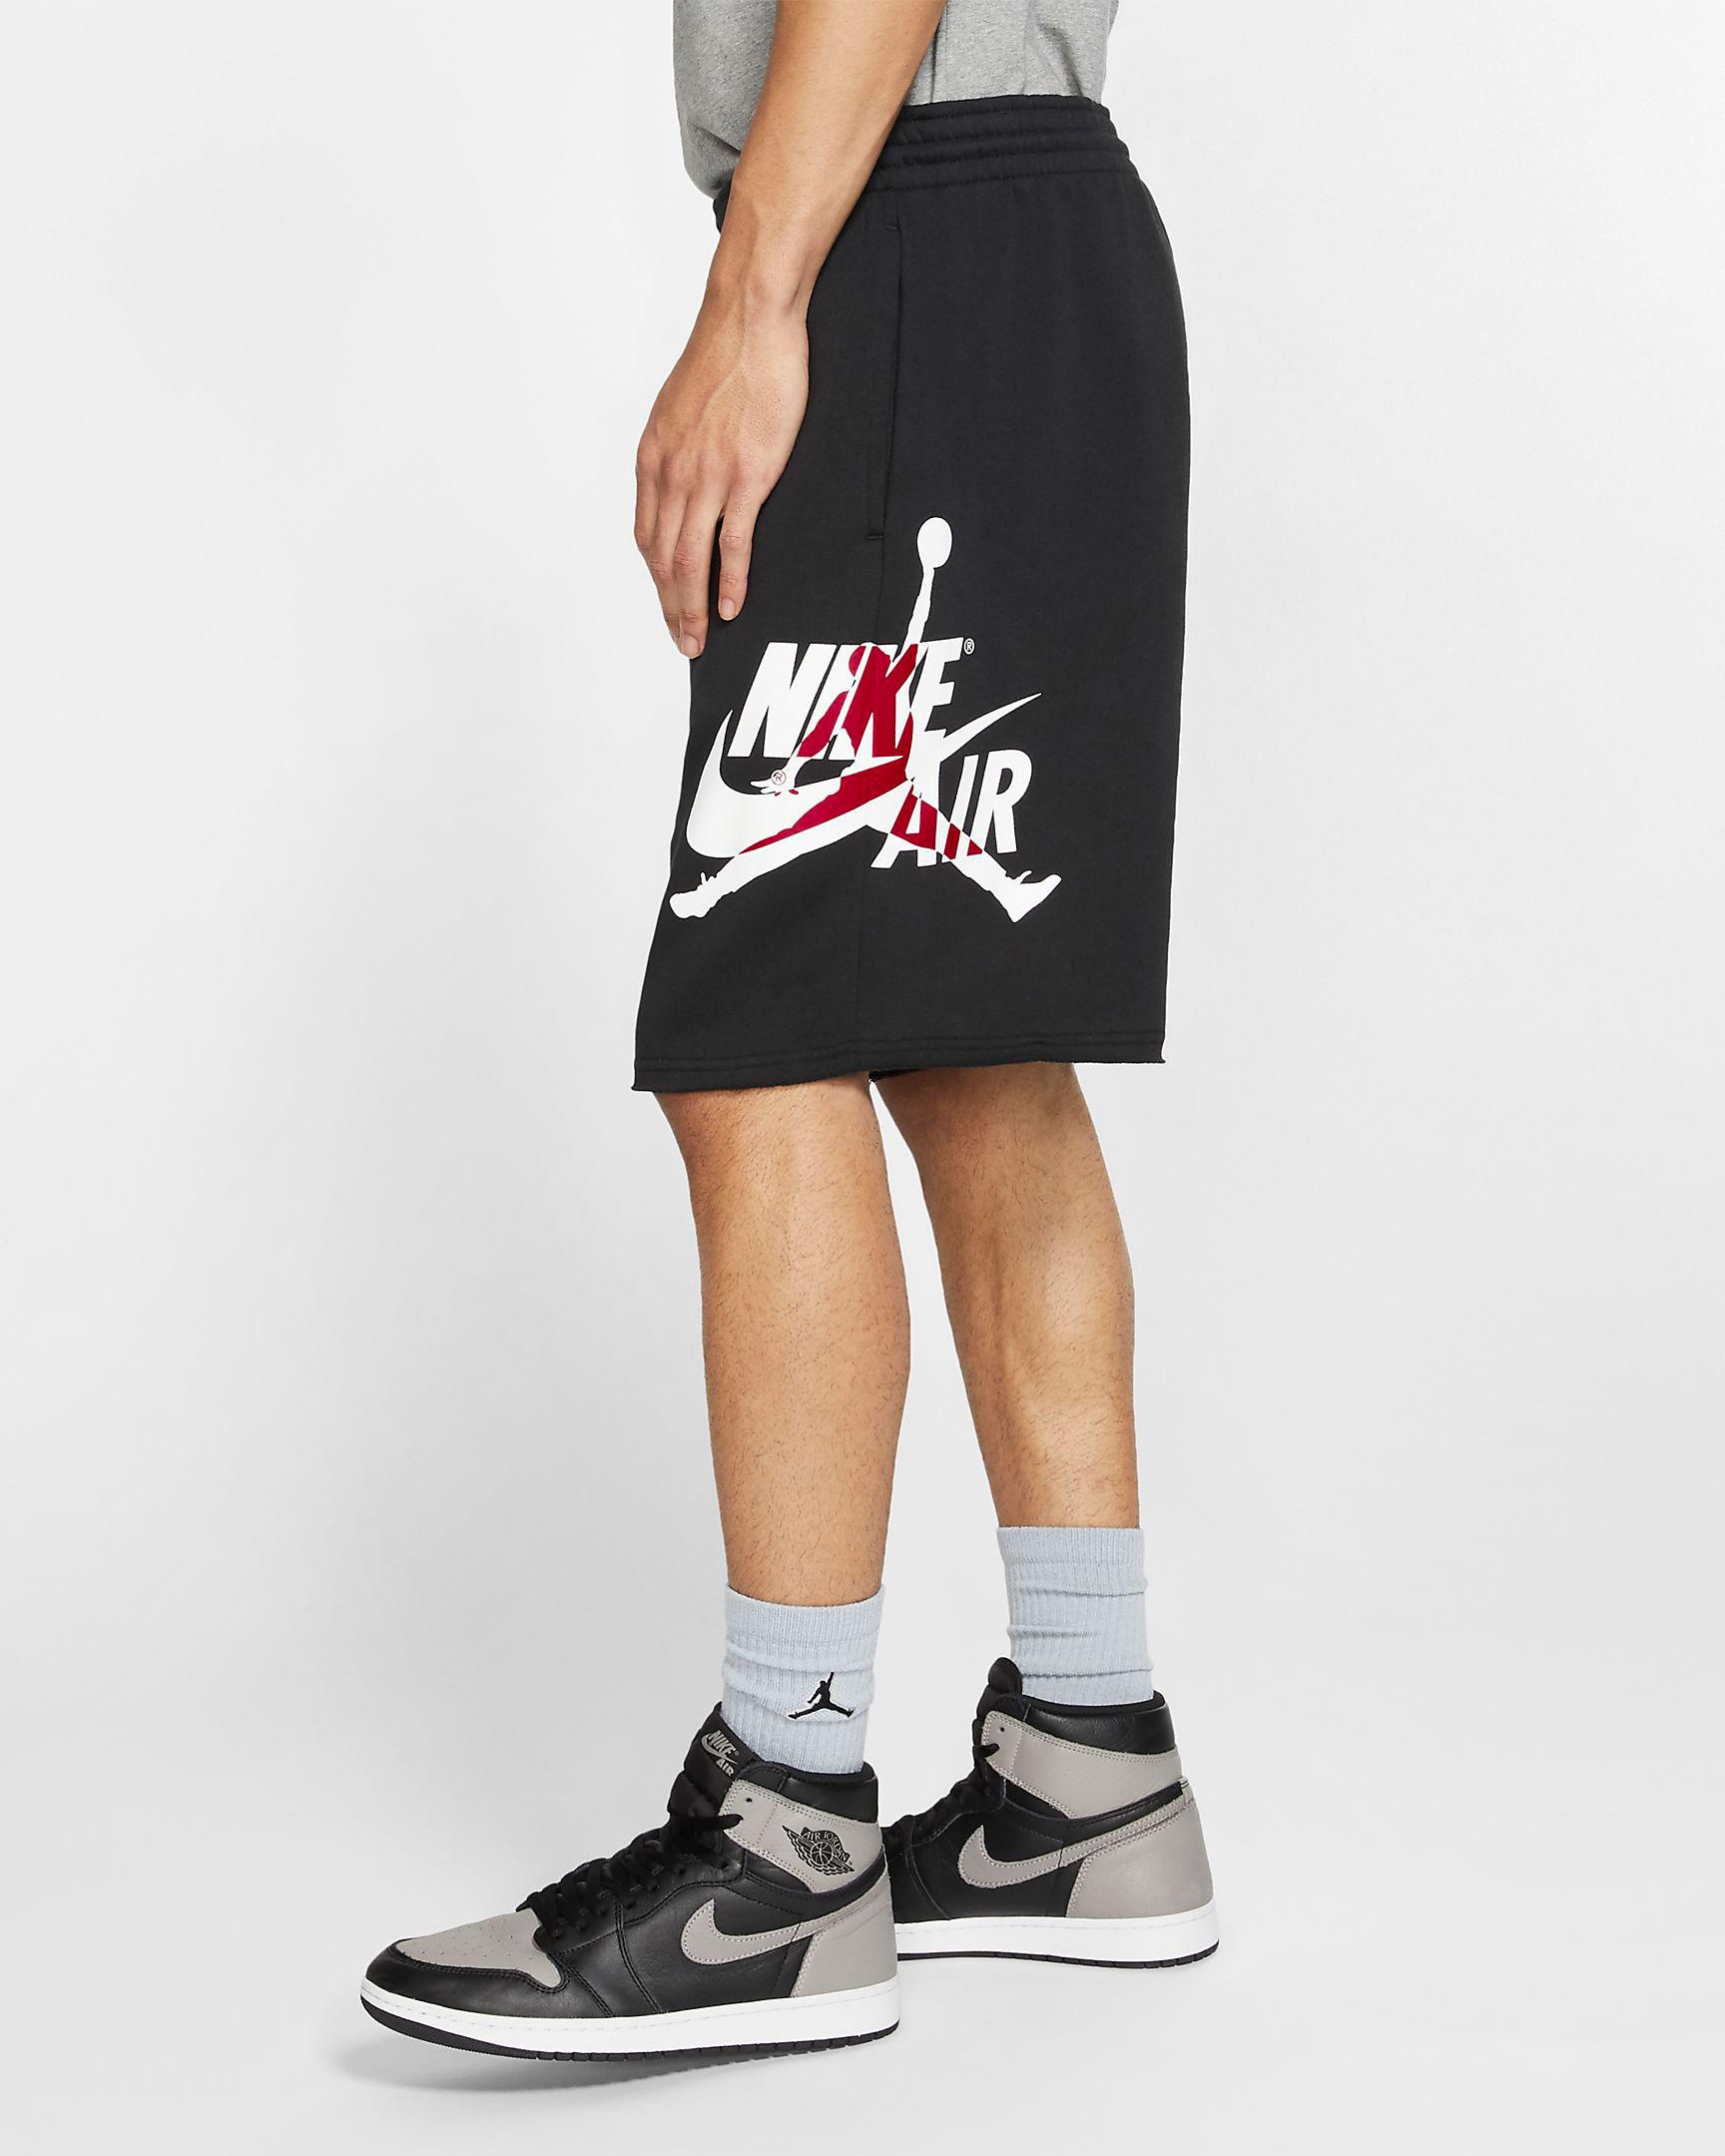 jordan 1 in shorts